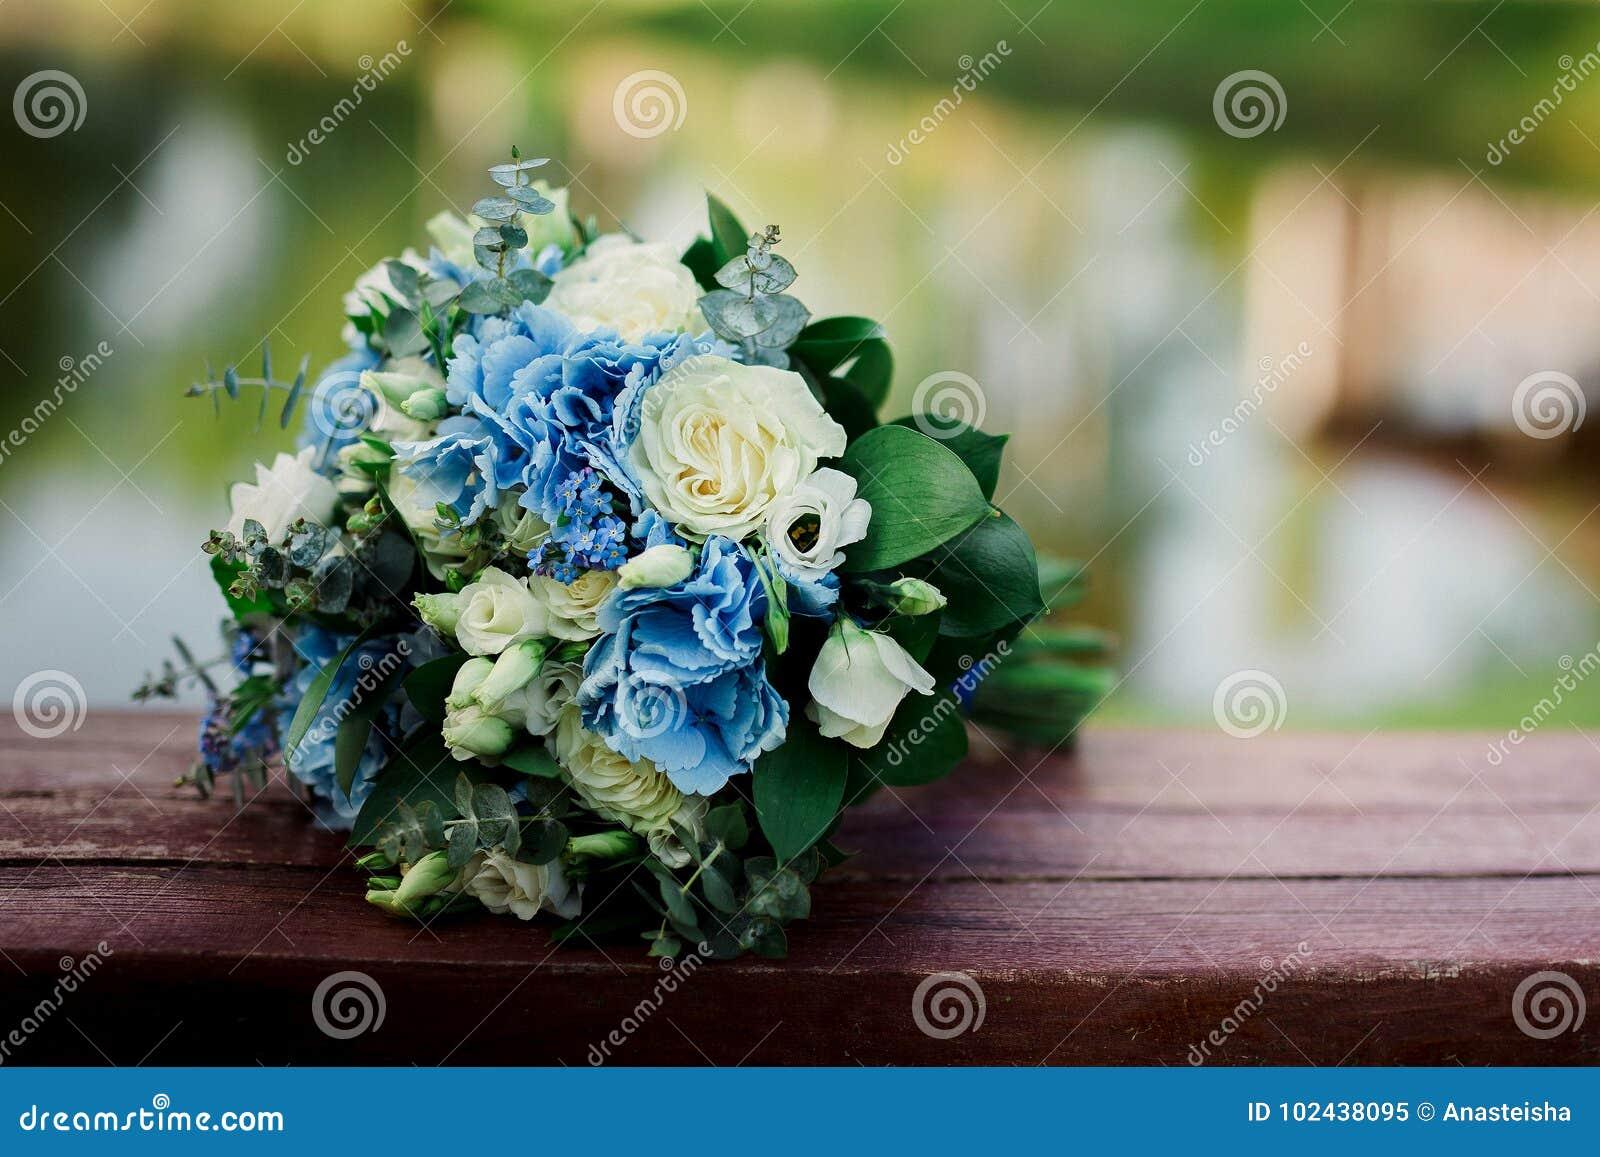 Beautiful Blue And White Fresh Flowers Wedding Bouquet Stock Image